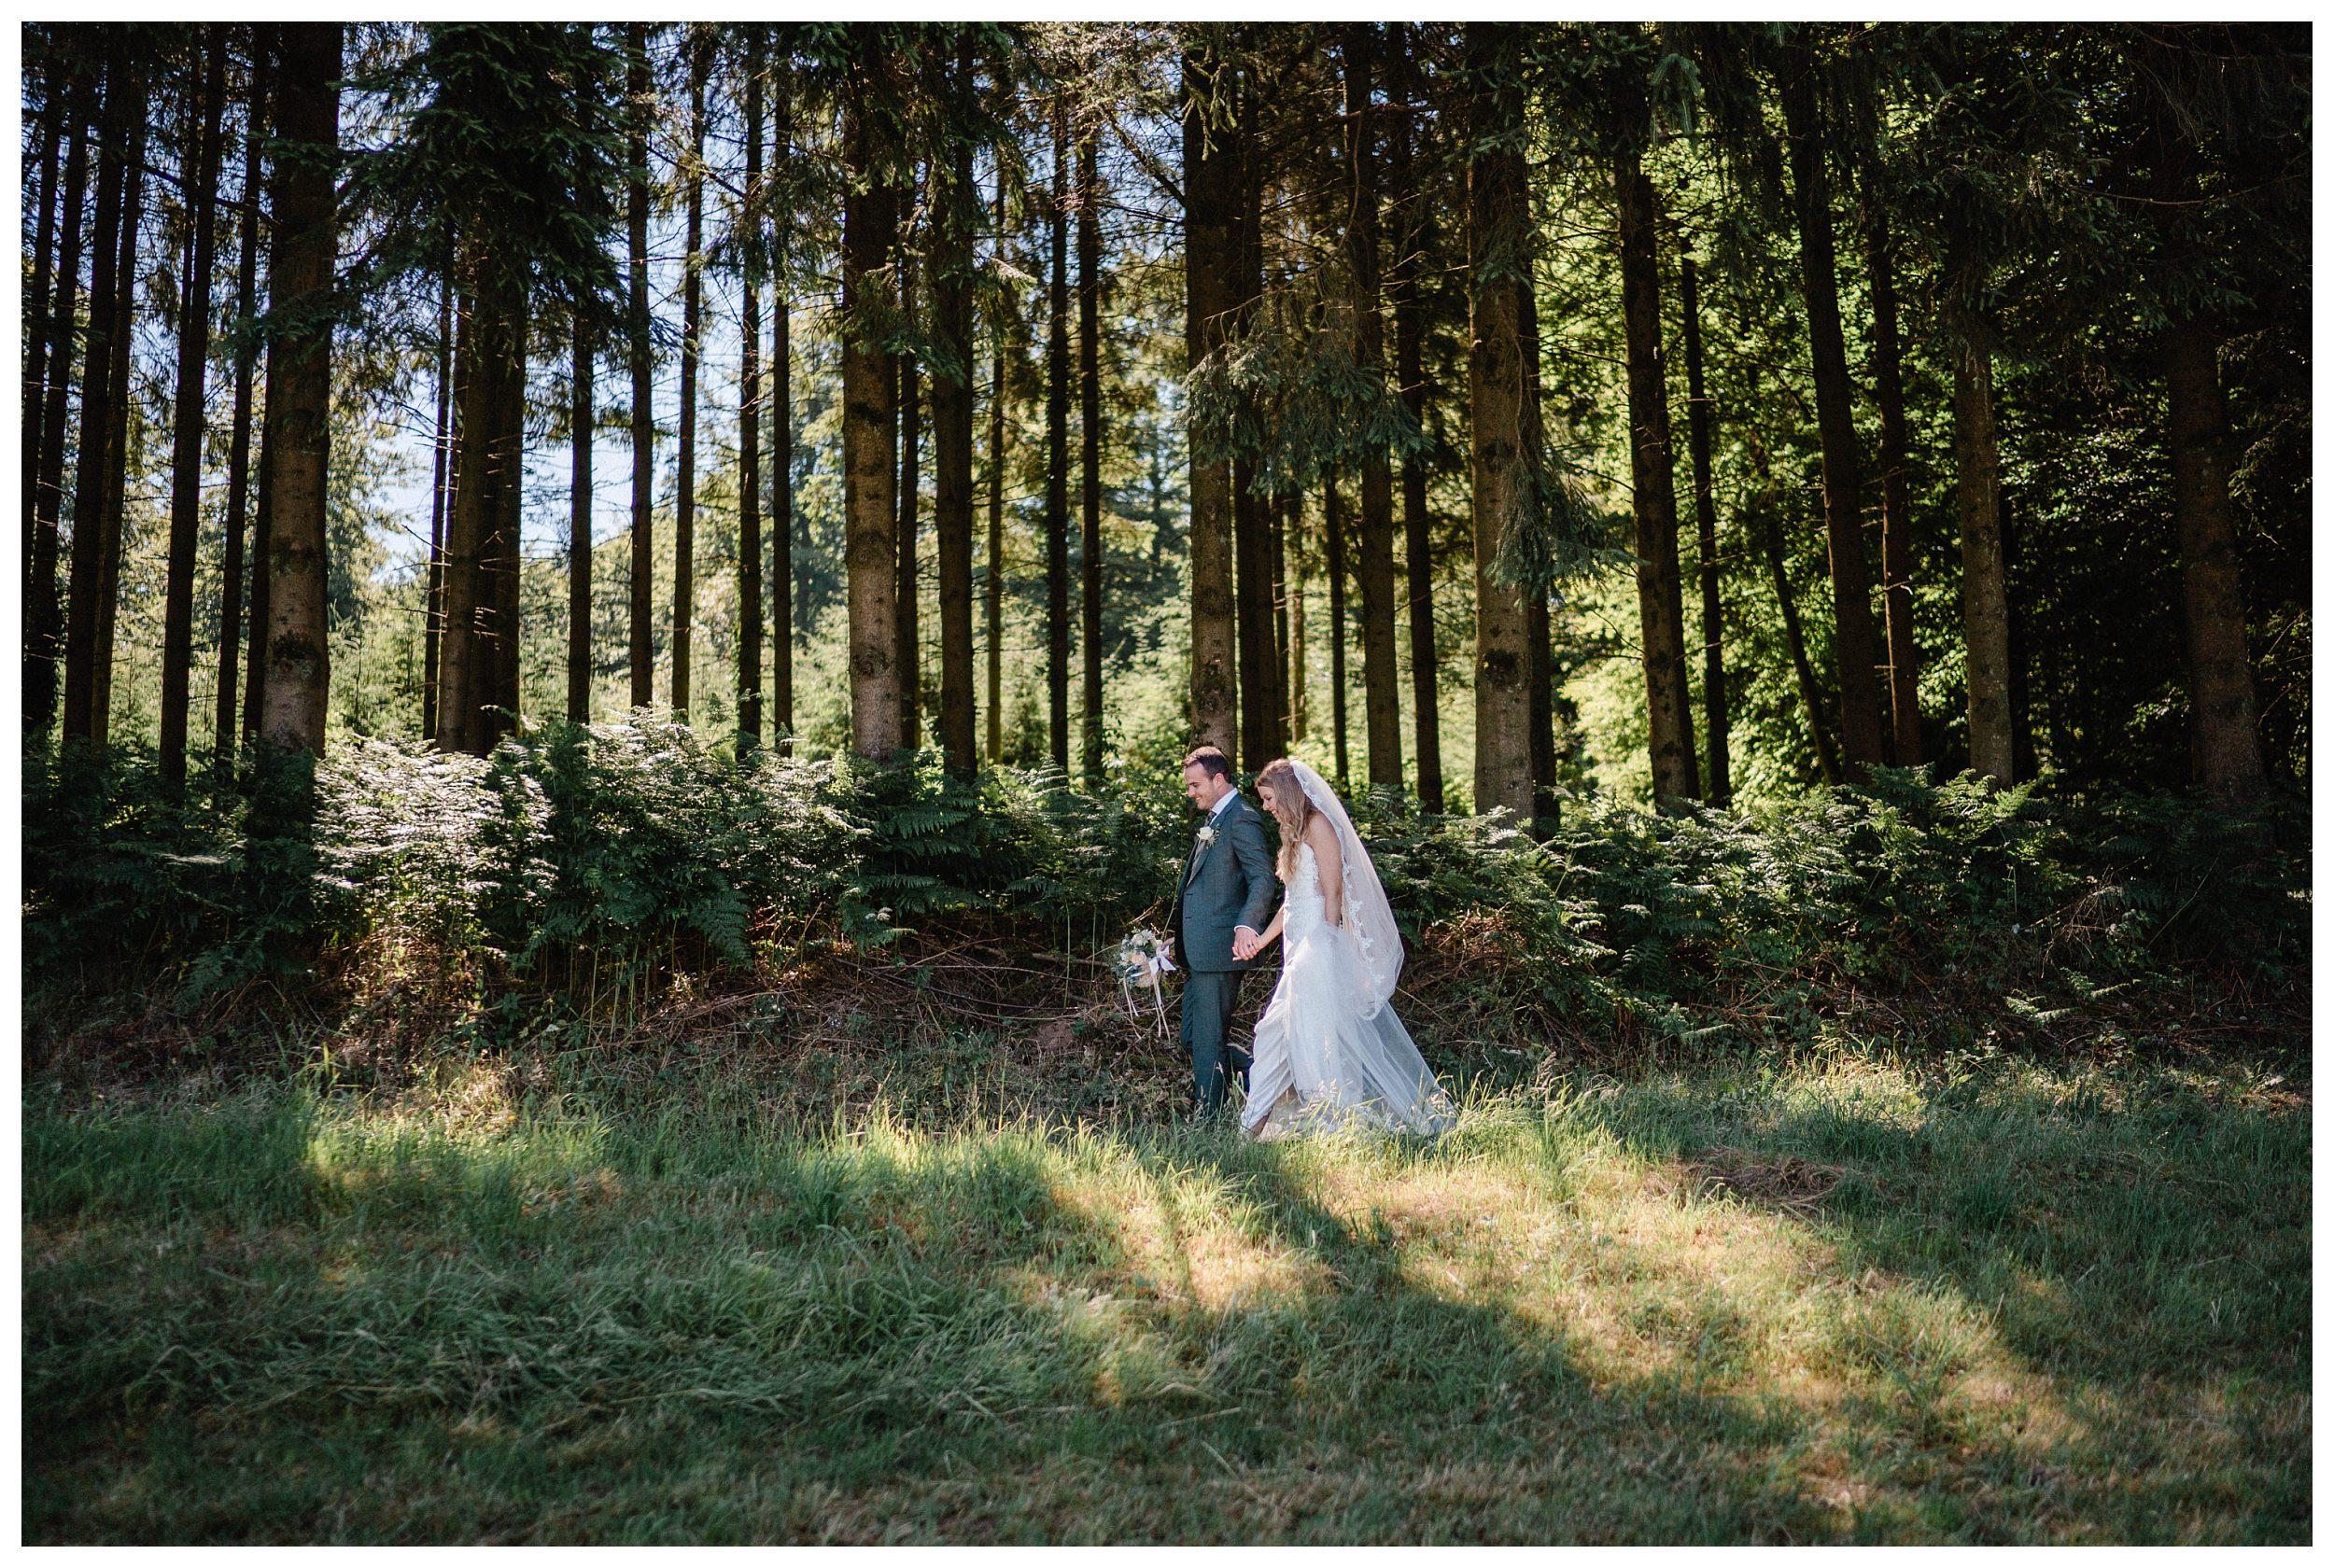 huwelijksfotograaf bruidsfotograaf destinationwedding huwelijksfotografie in ardennen nederland (49).jpg